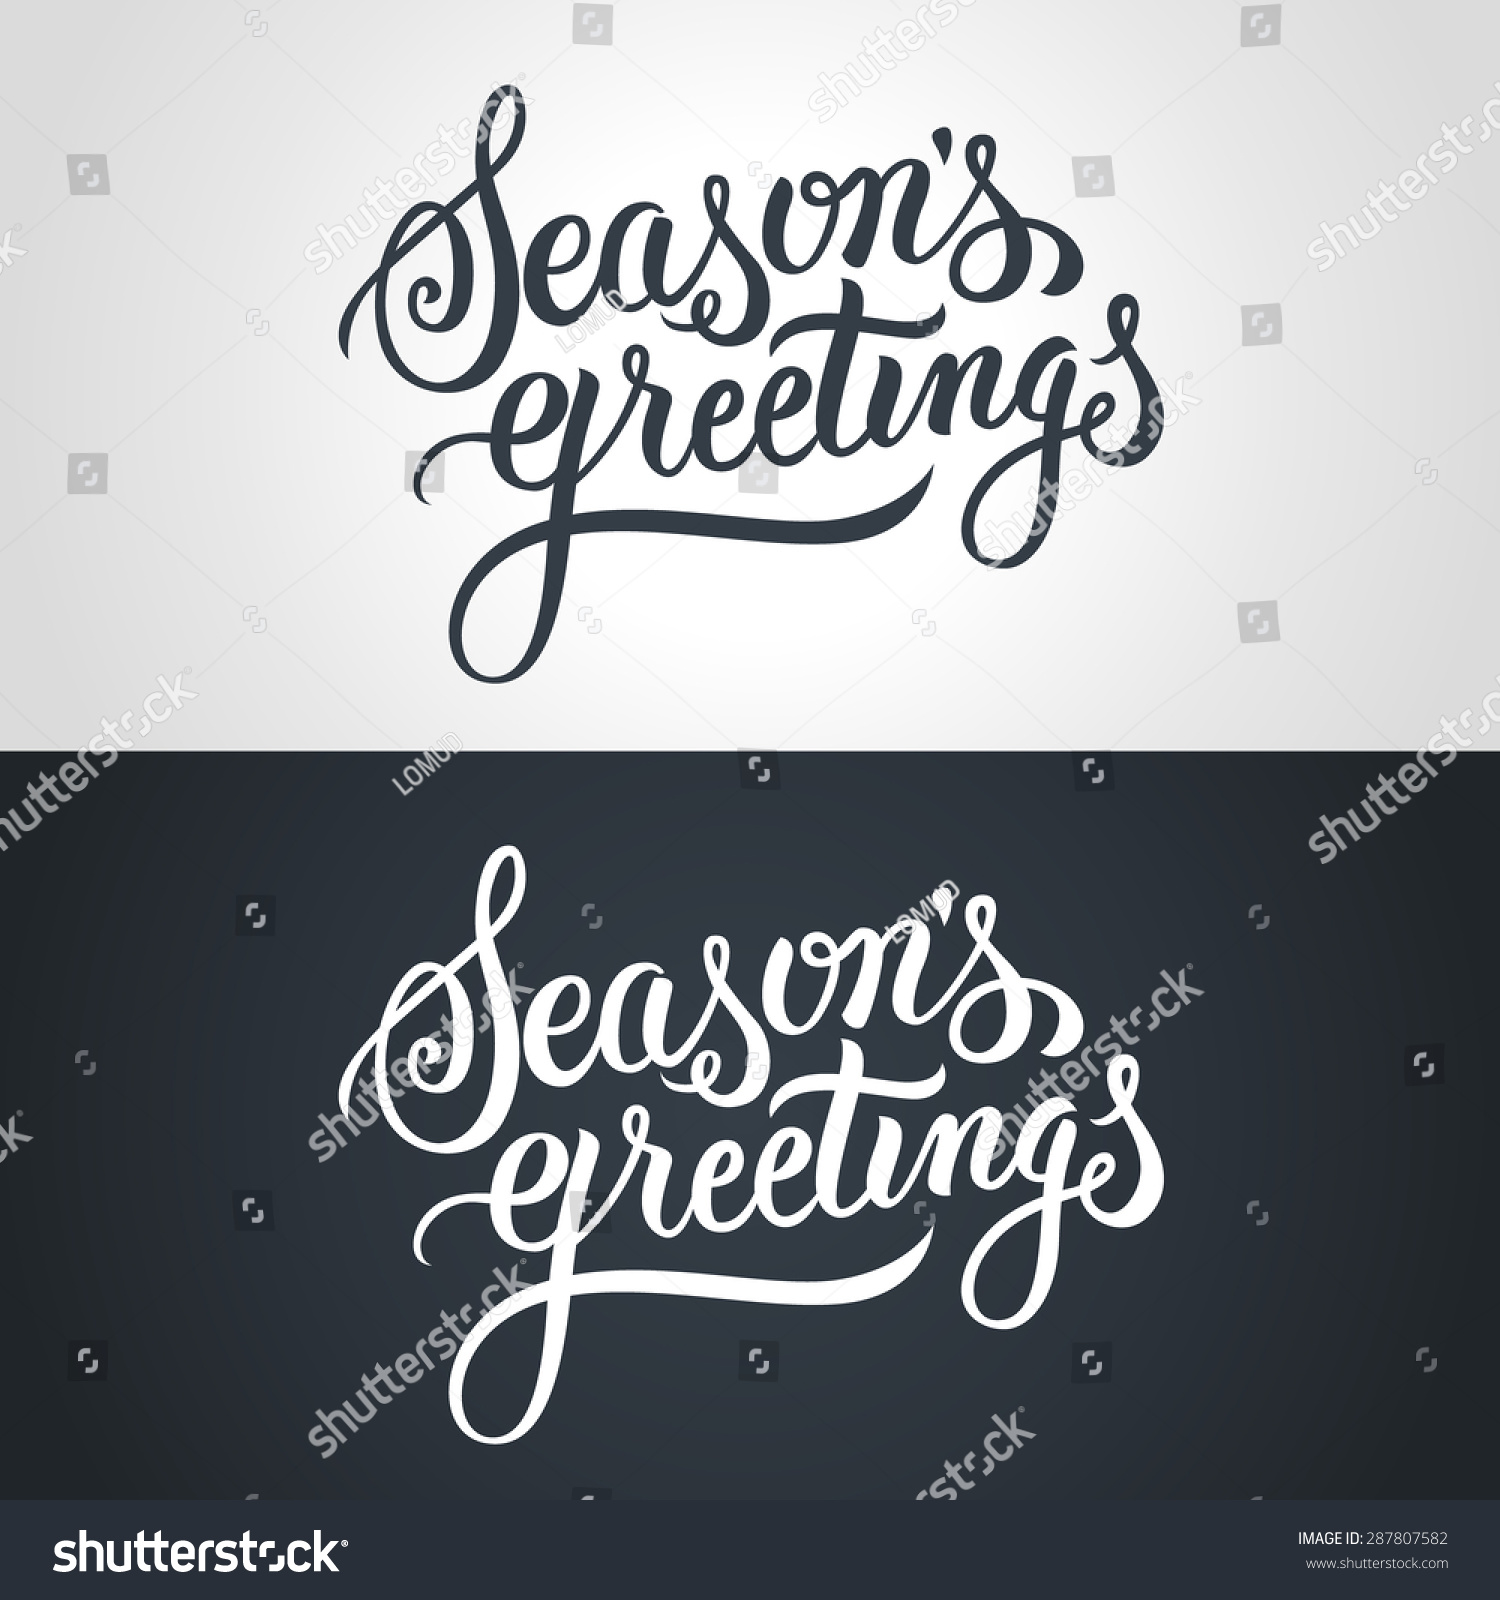 Royalty Free Seasons Greetings Hand Lettering 287807582 Stock